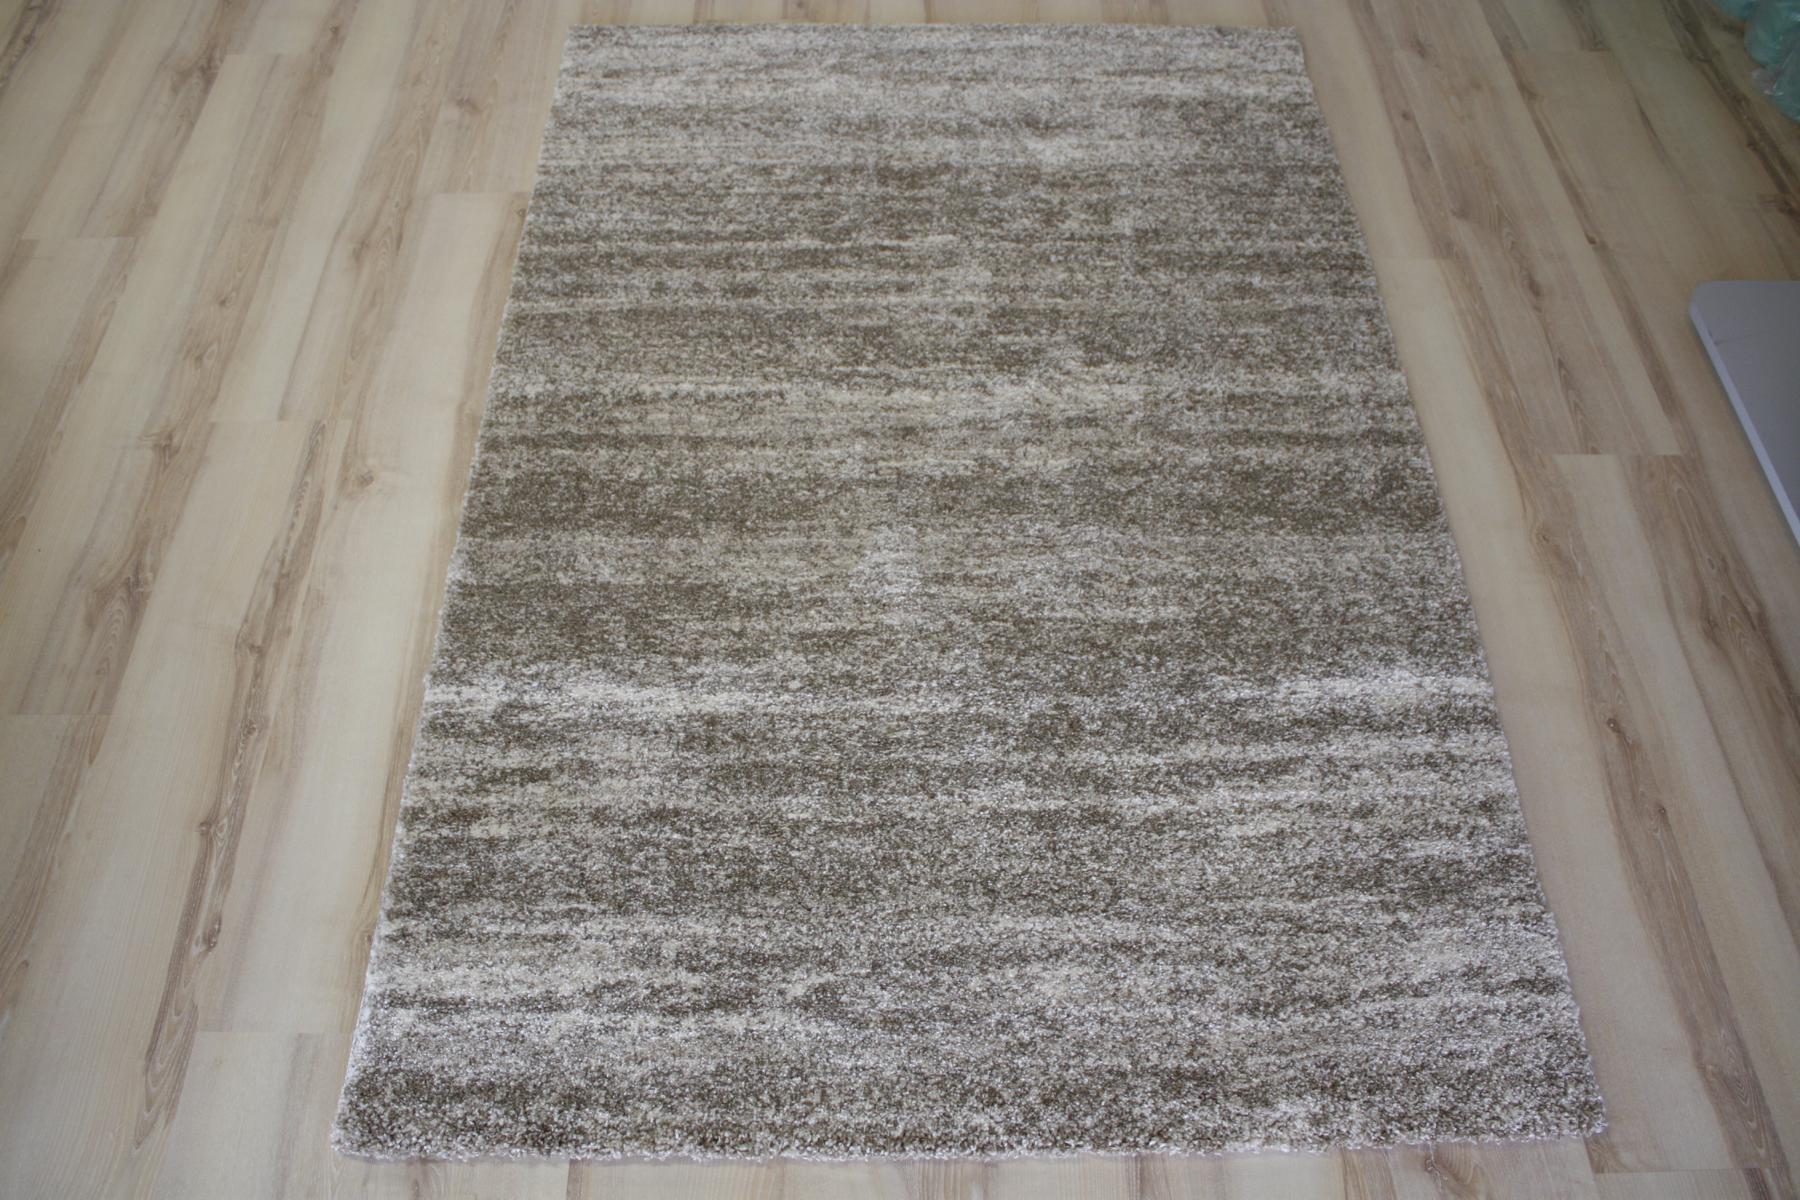 astra samoa teppich 6870 150 063 hellbraun 120x180cm neu ebay. Black Bedroom Furniture Sets. Home Design Ideas